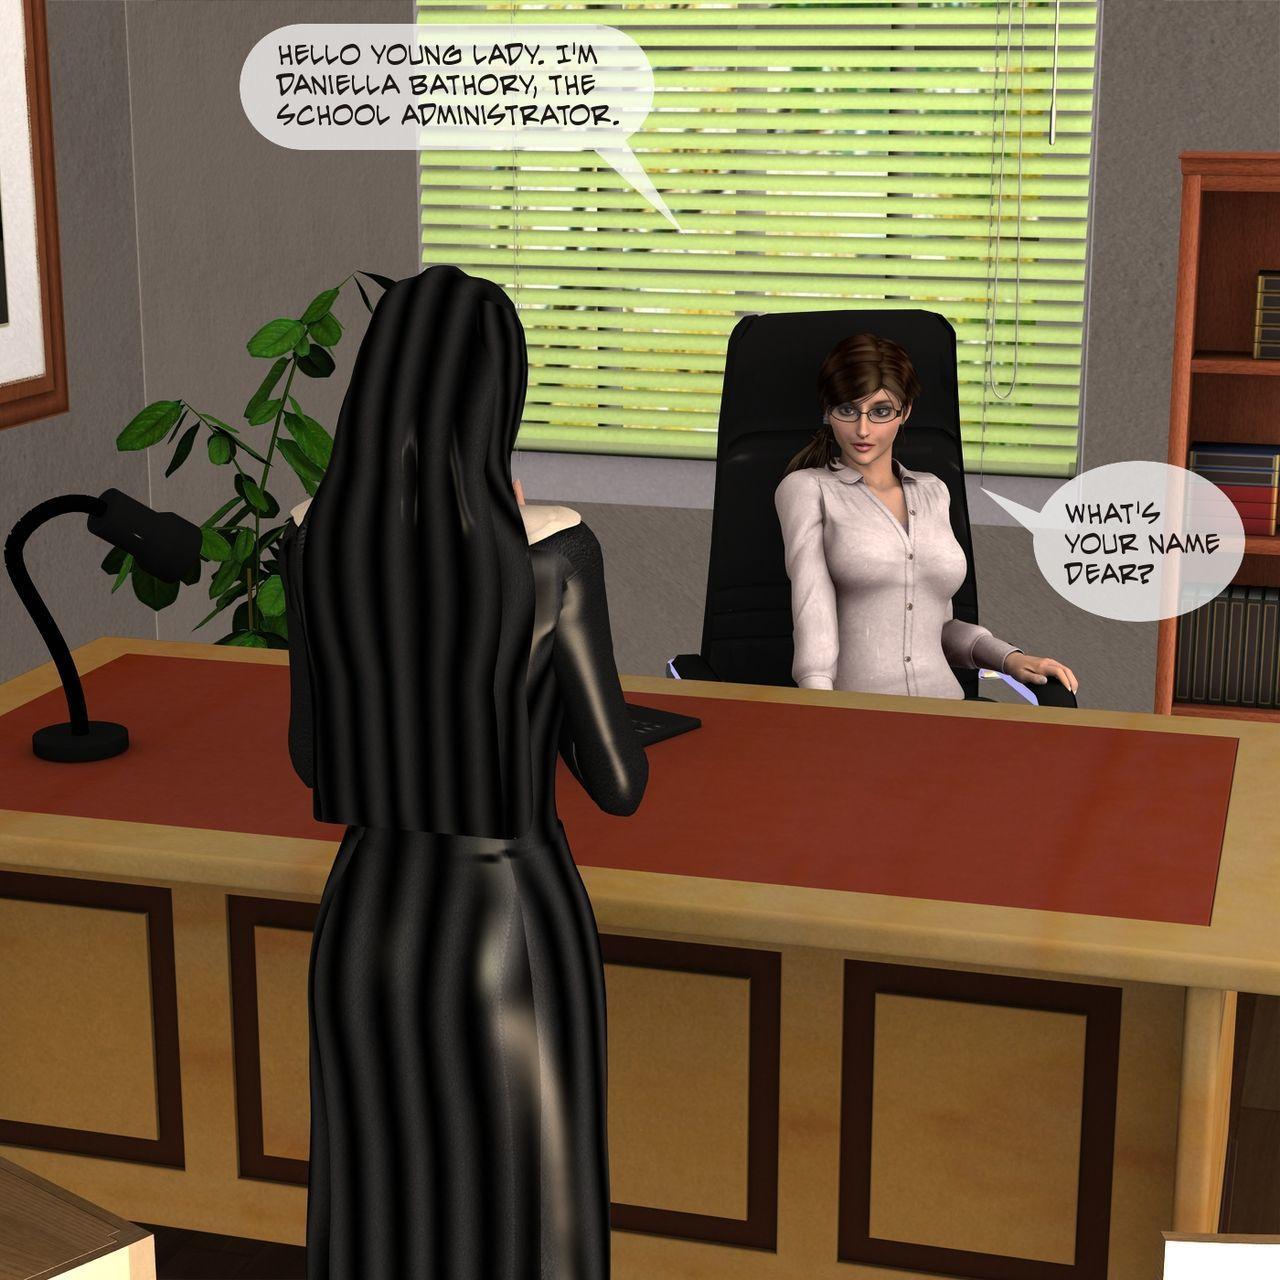 [Fasdeviant] Ashbury Private Health Resort - Chapter 6 - part 2